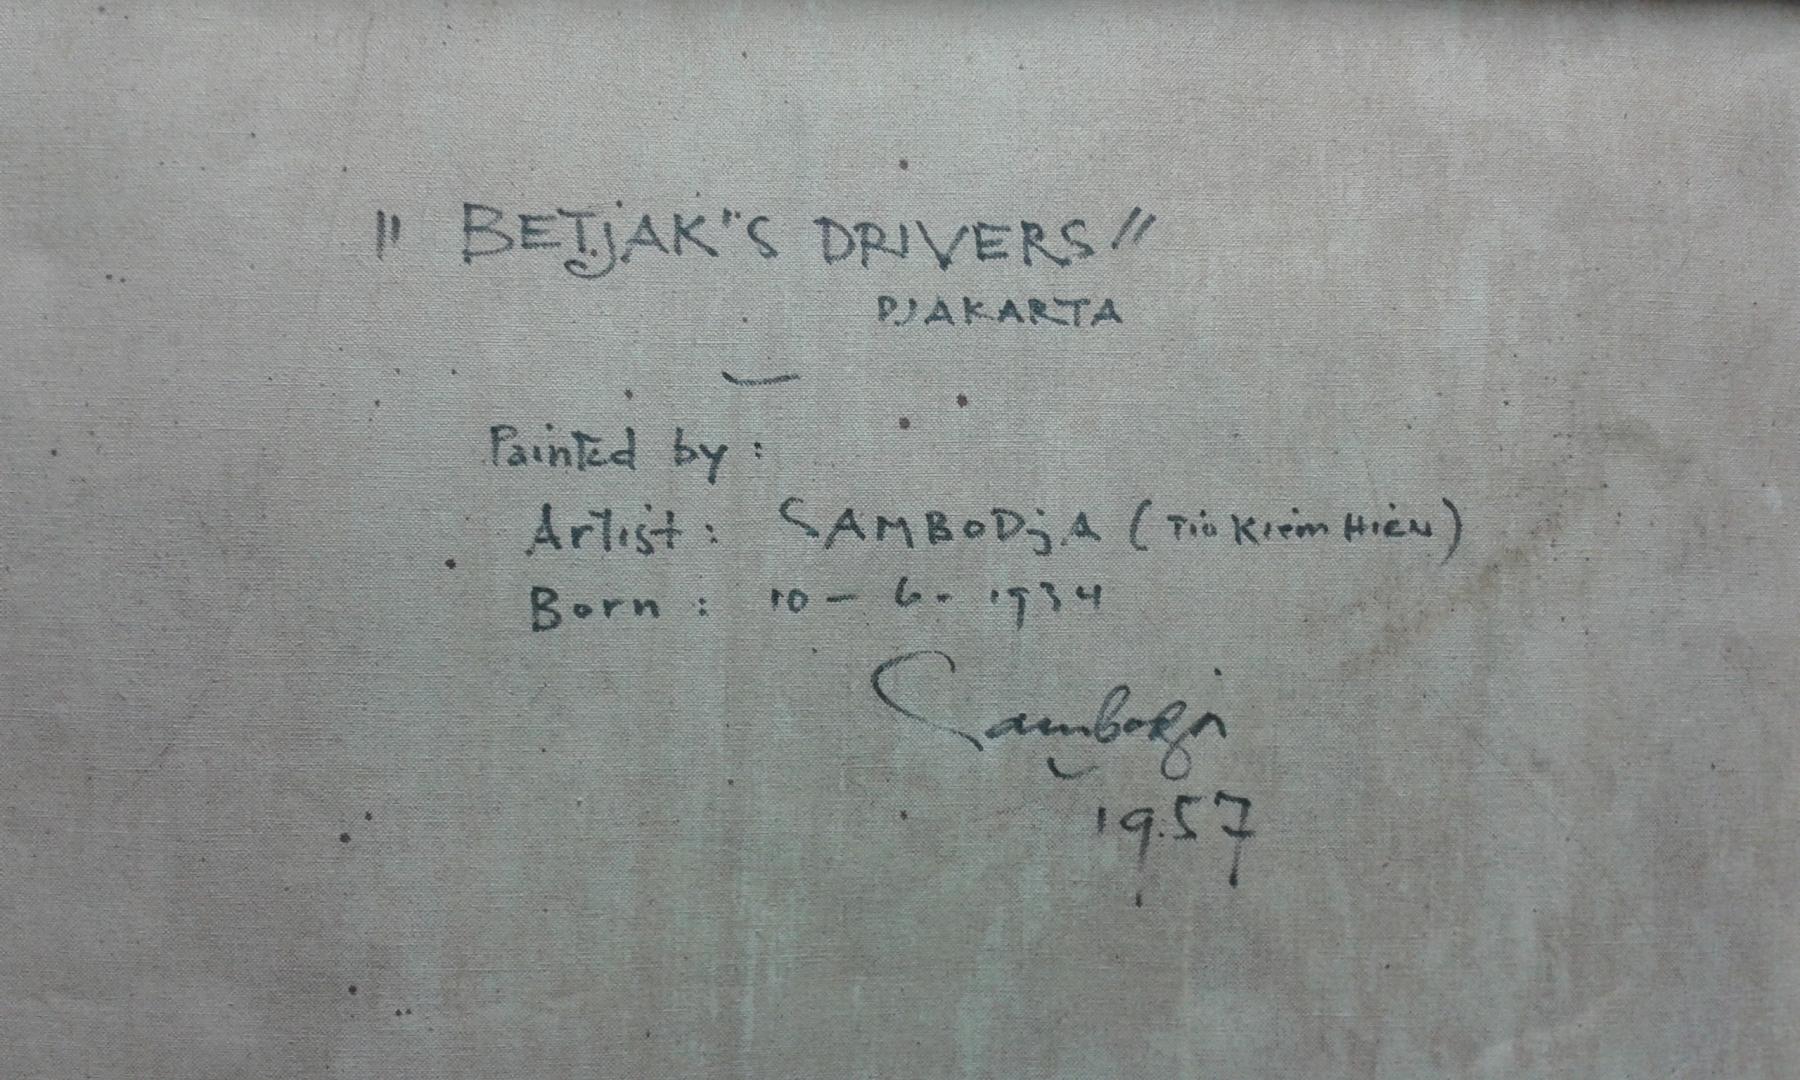 Sambodja- Betjak's drivers Djakarta verso details